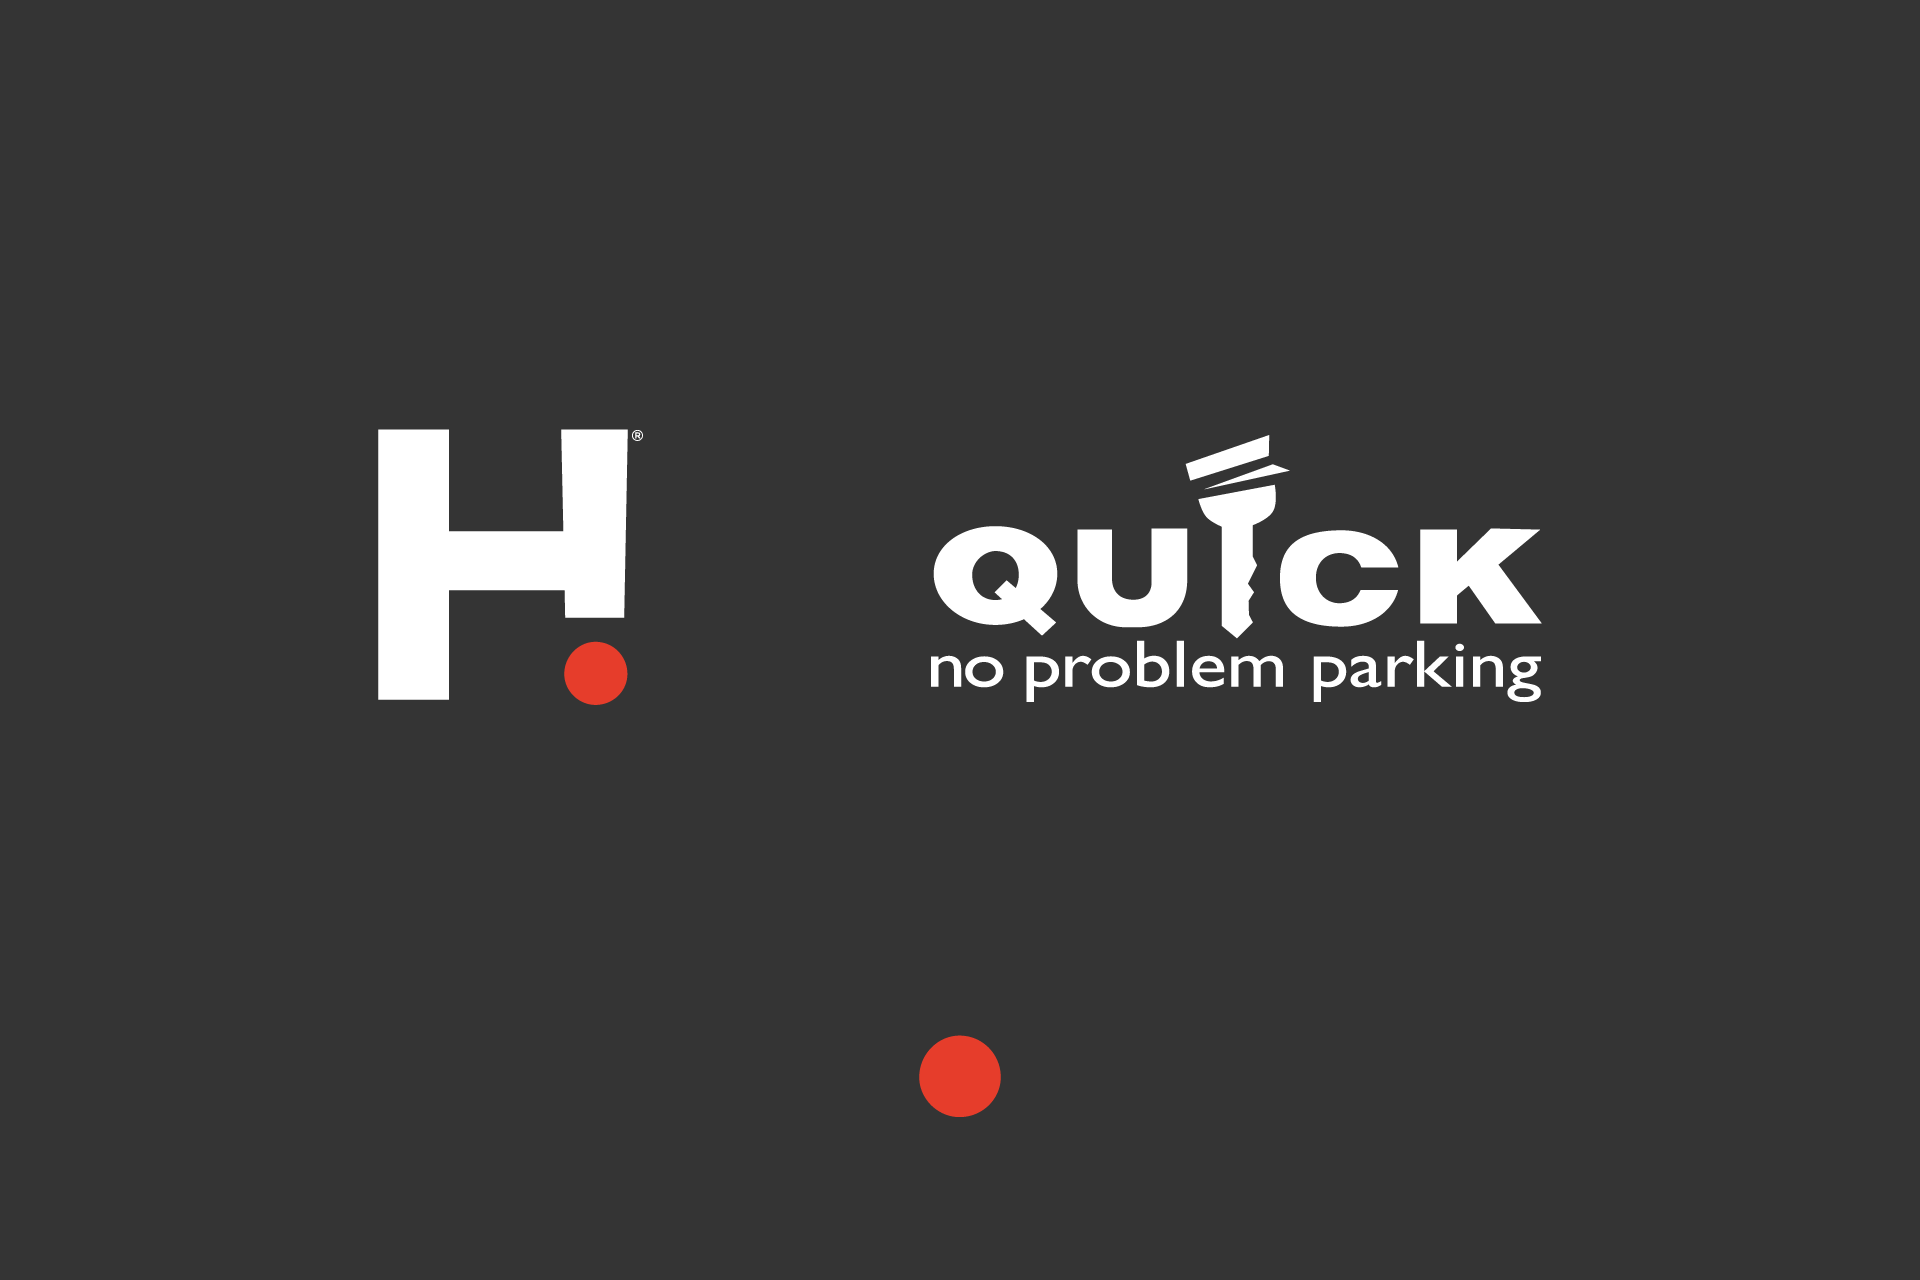 Hurry Up & Quick No Problem Parking